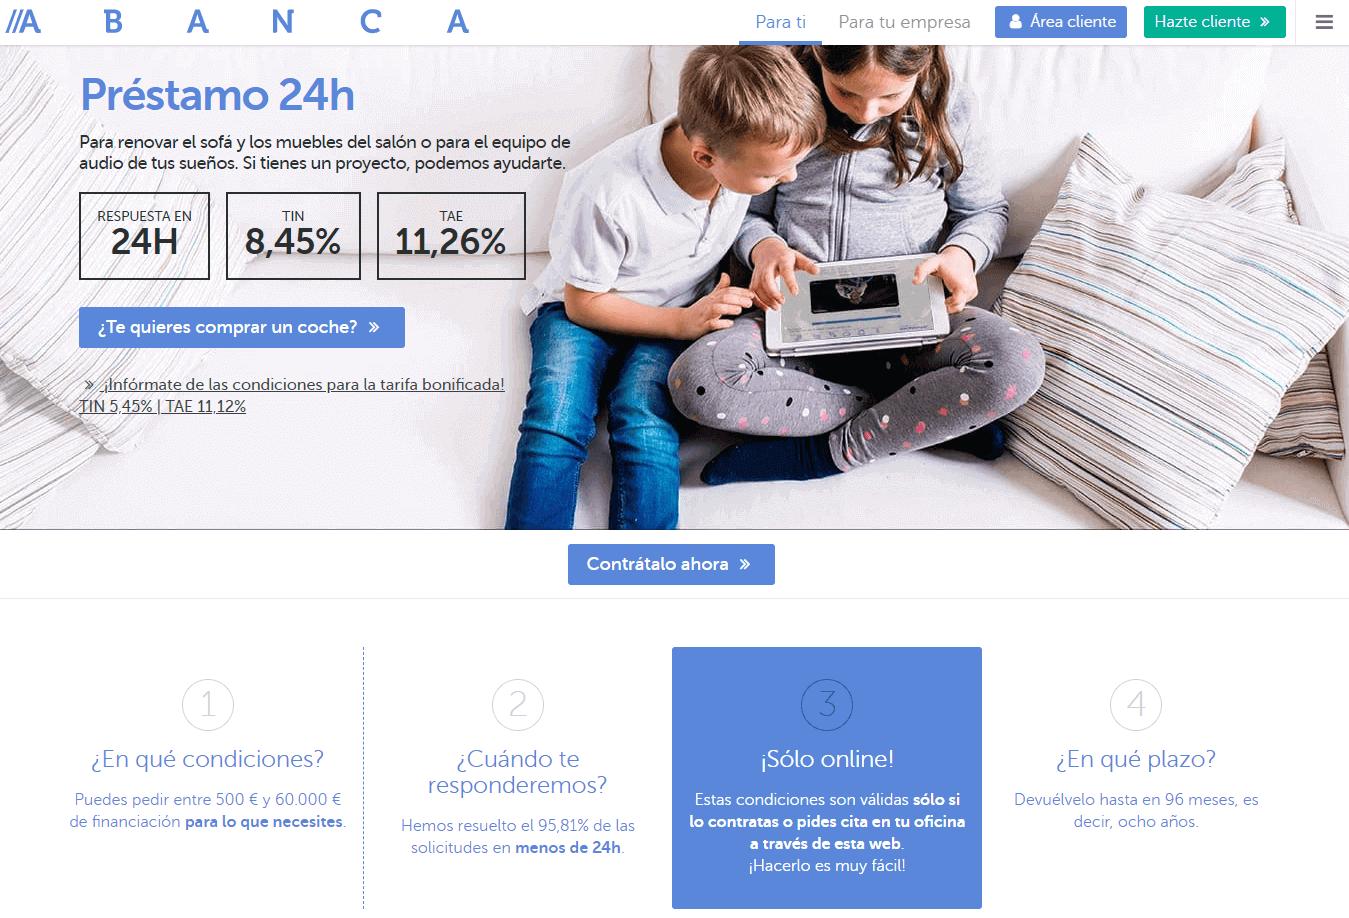 Abanca préstamo sitio web